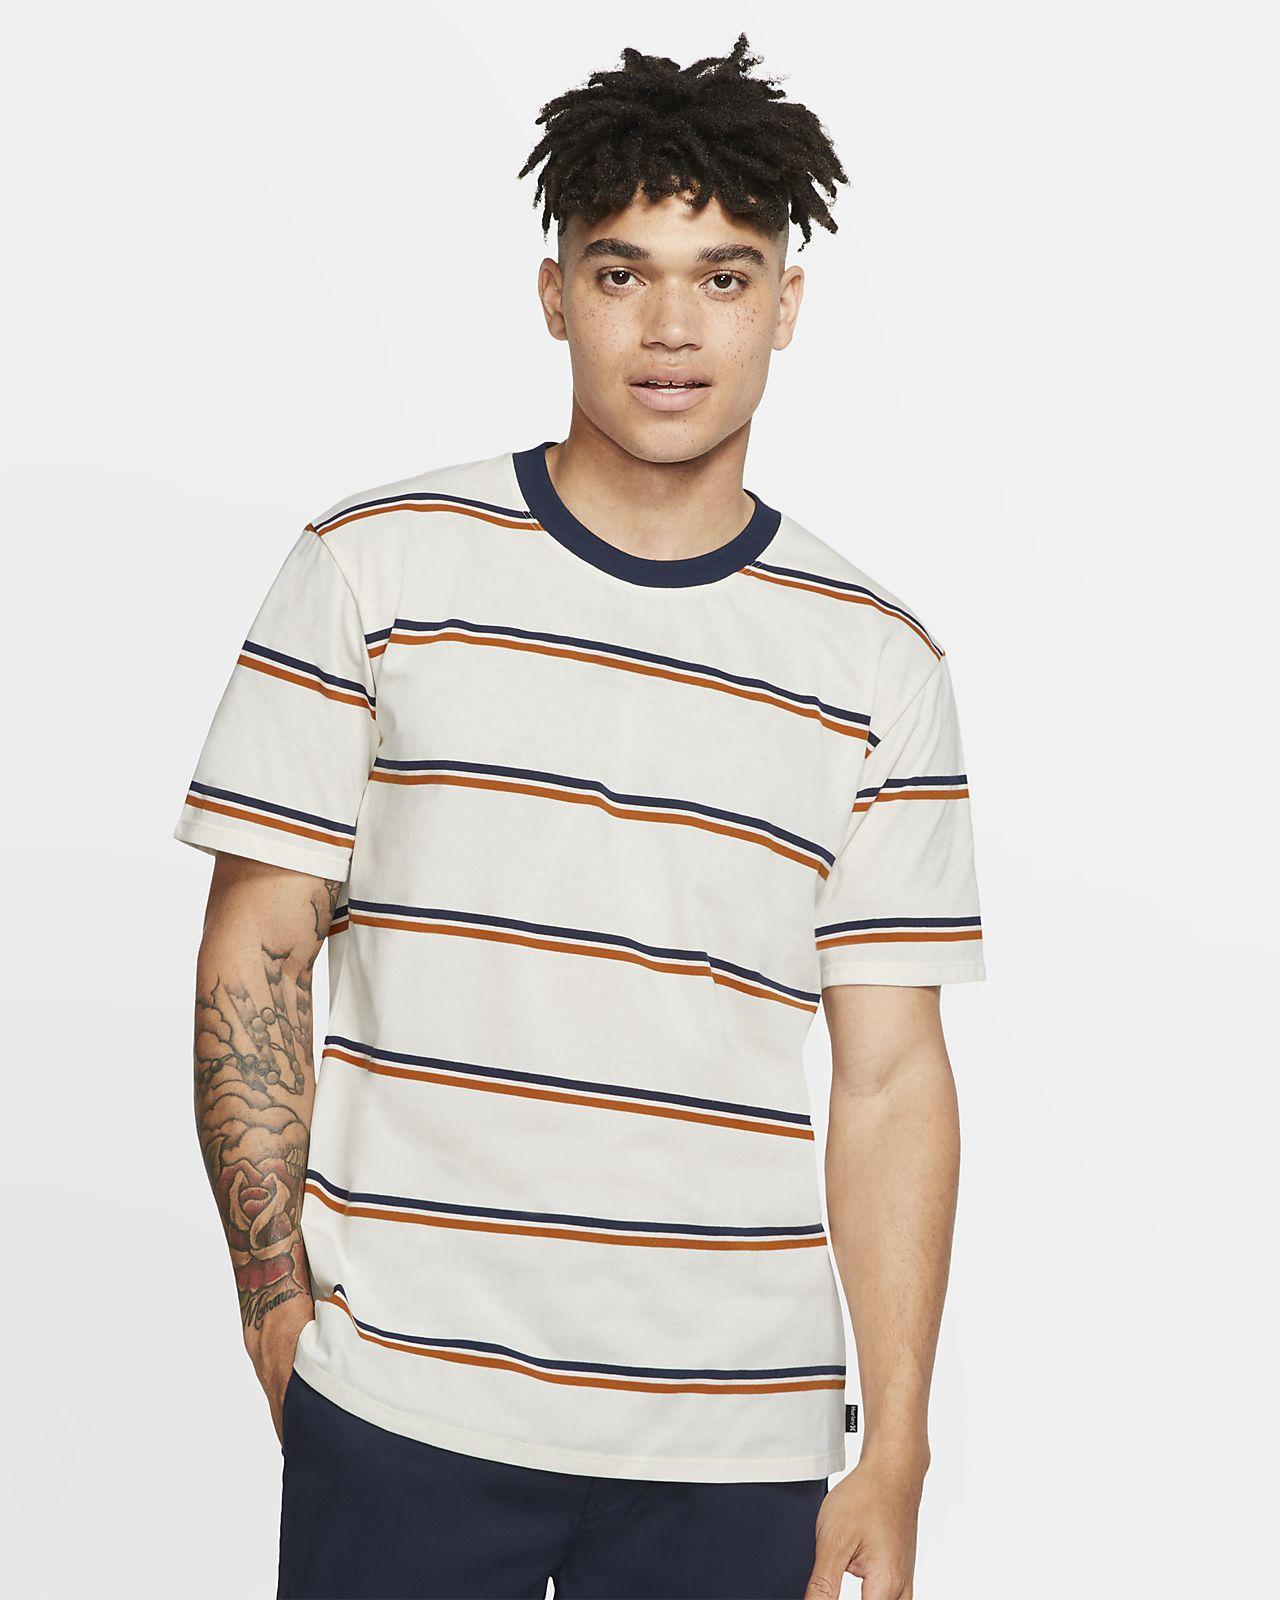 Hurley Dri-FIT Harvey Stripe Men's Short-Sleeve Top